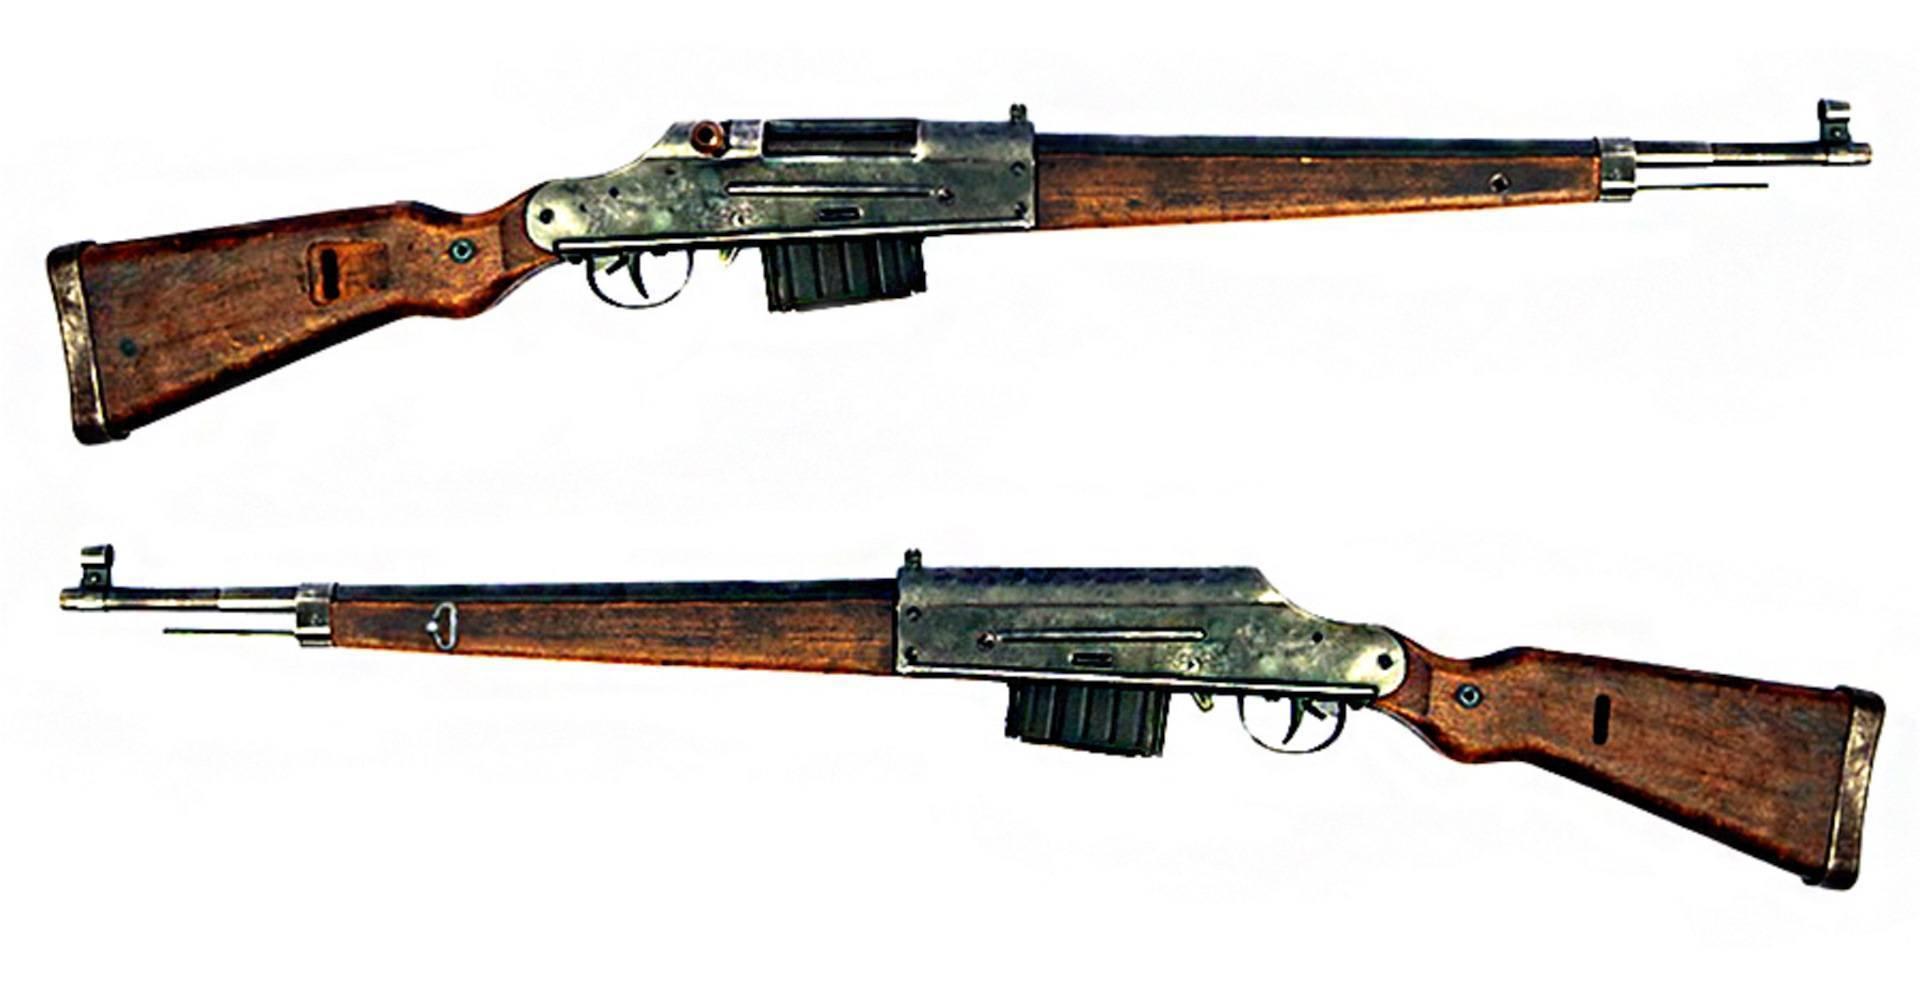 Volkssturmgewehr 1-5 — википедия с видео // wiki 2